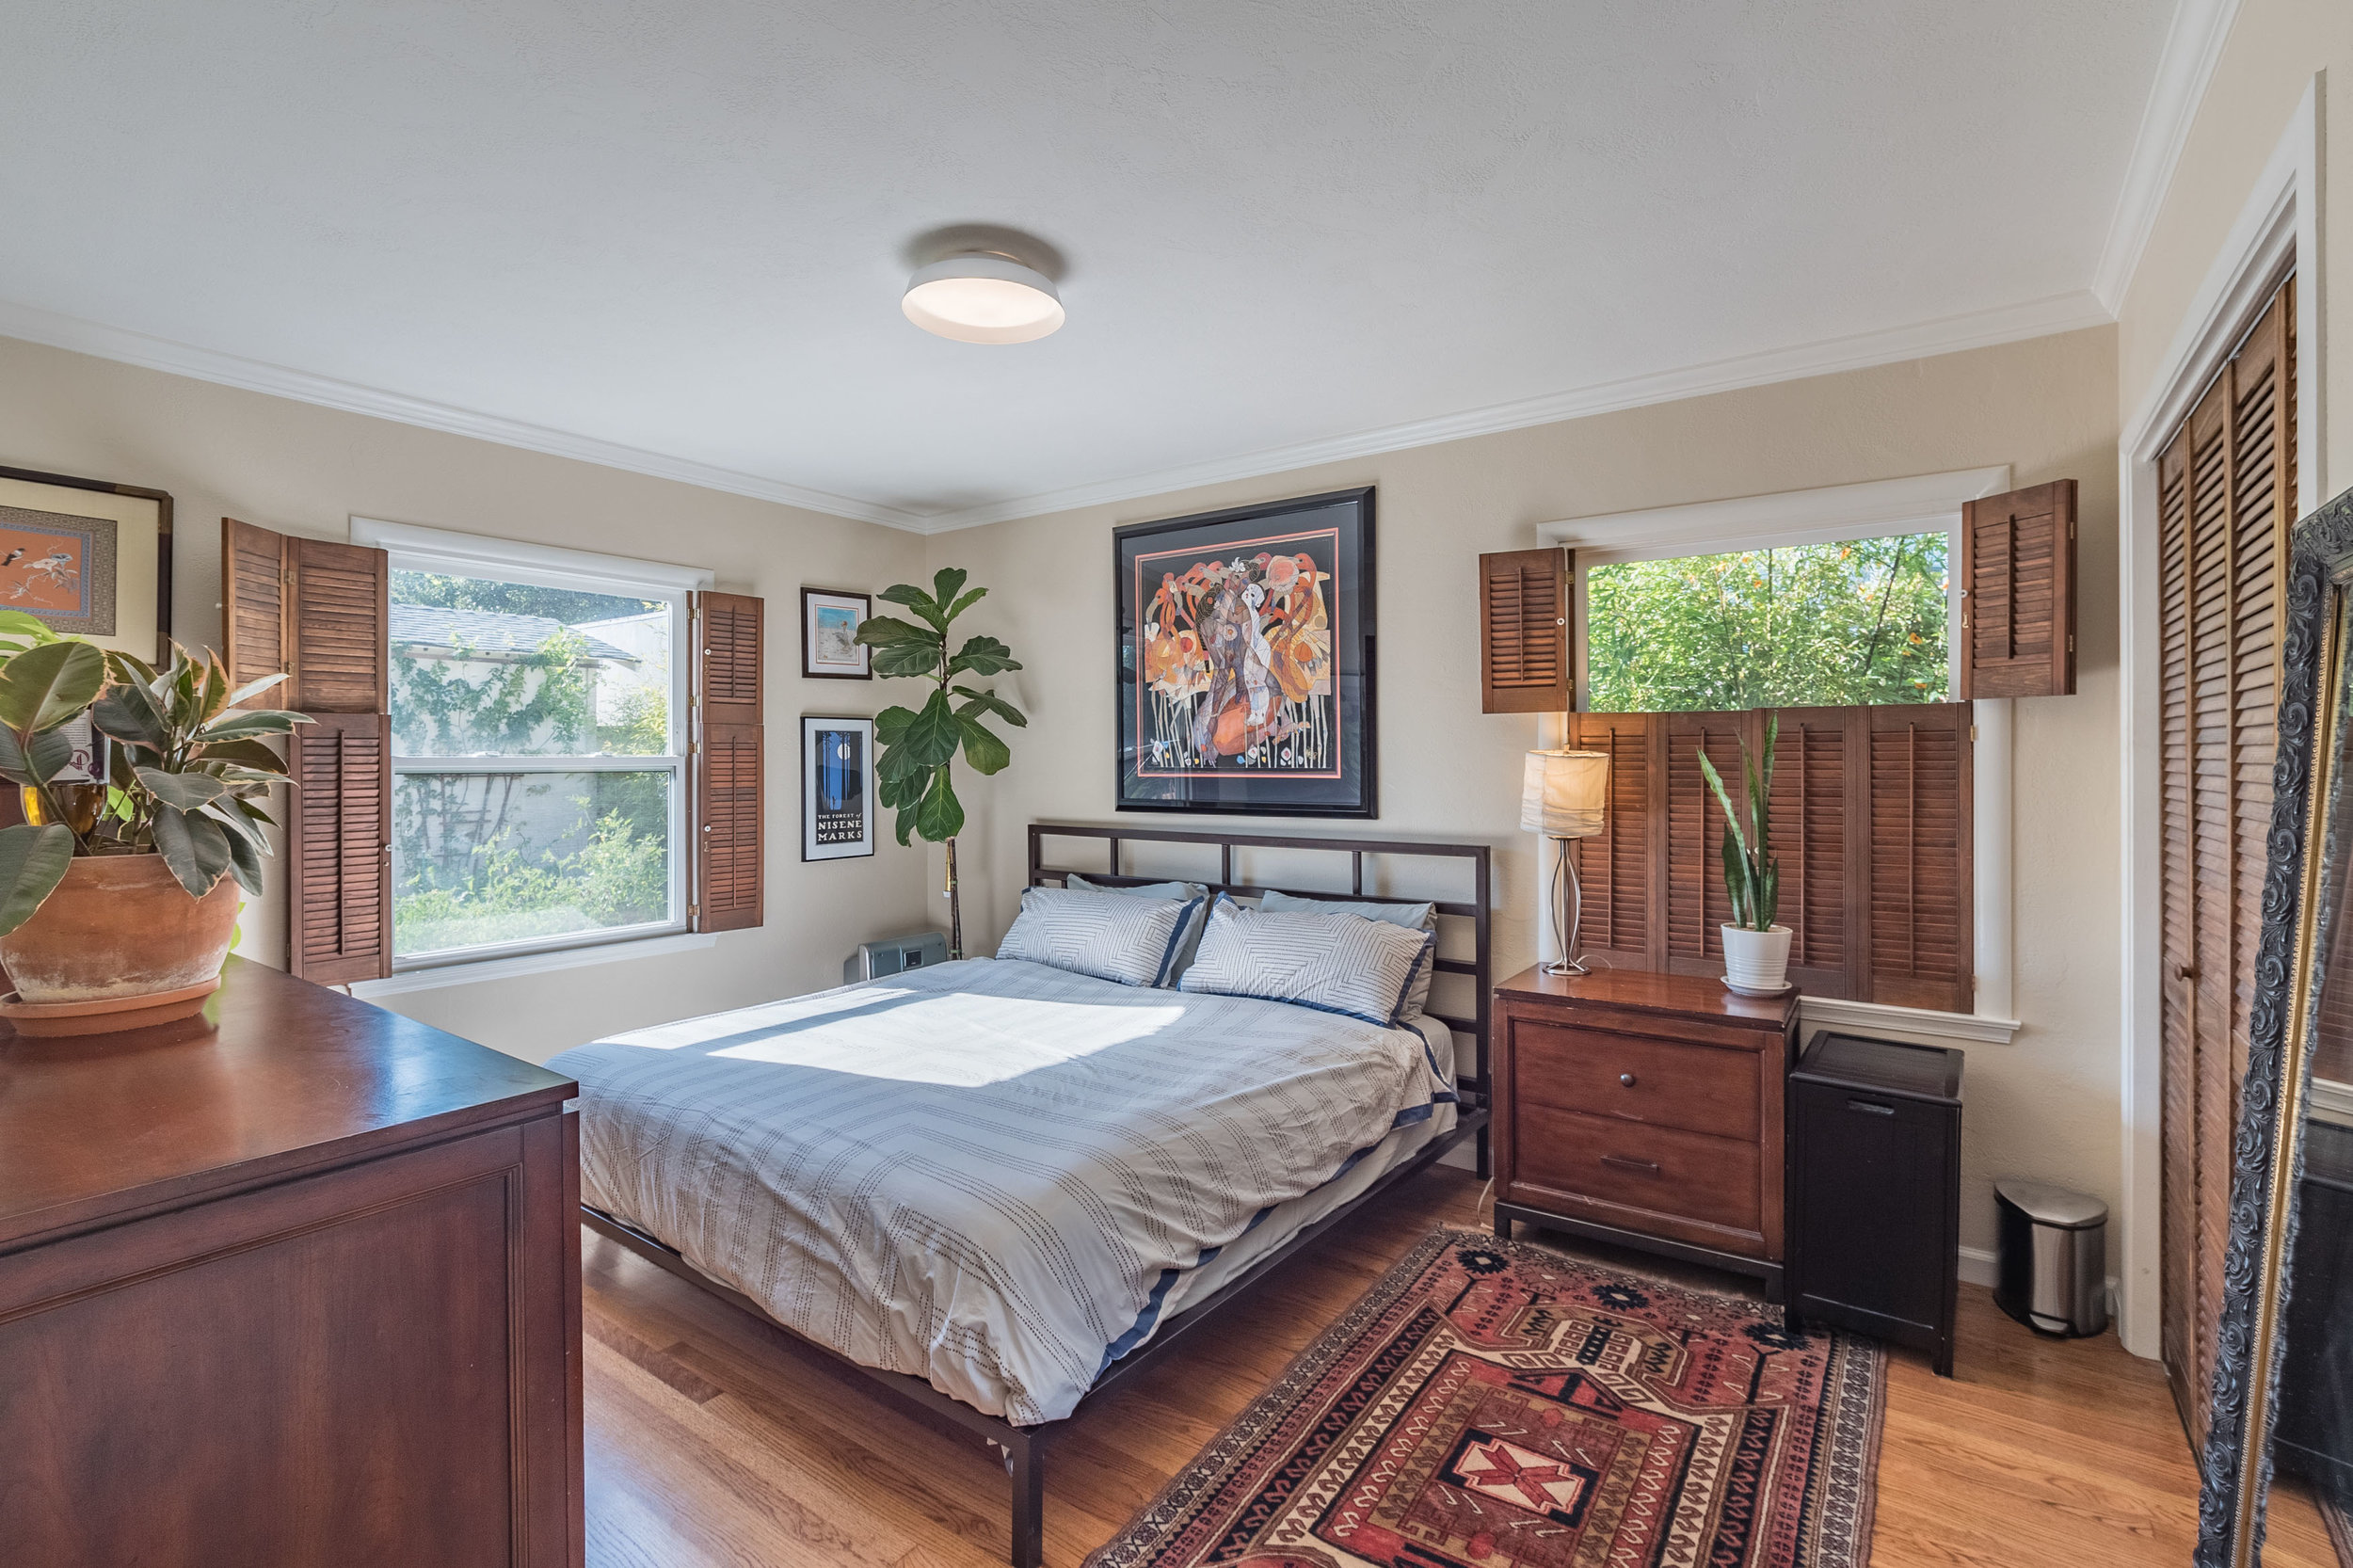 3 Bedroom 2 Bathroom Home for Sale in Santa Cruz